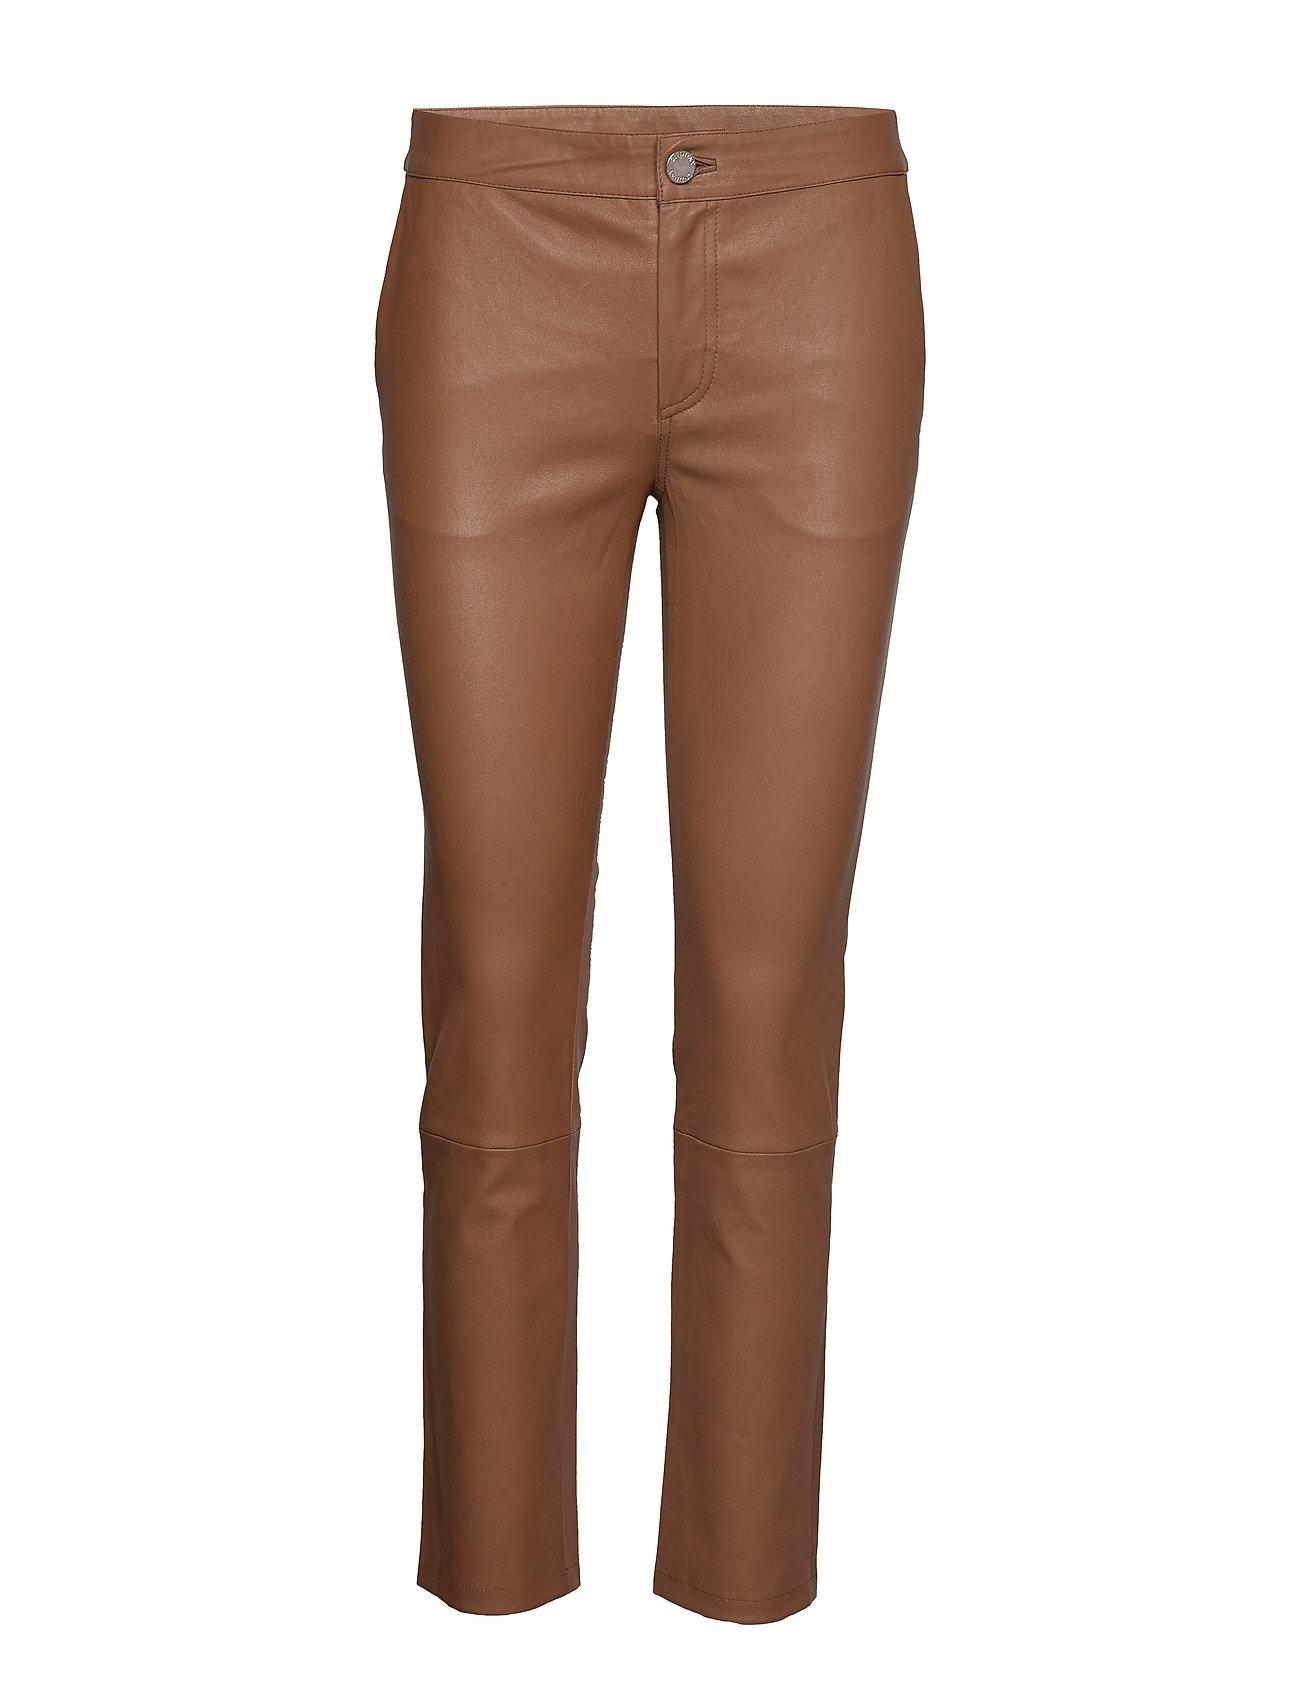 Image of 2nd Leya Leather Leggings/Bukser Brun 2NDDAY (3184437683)